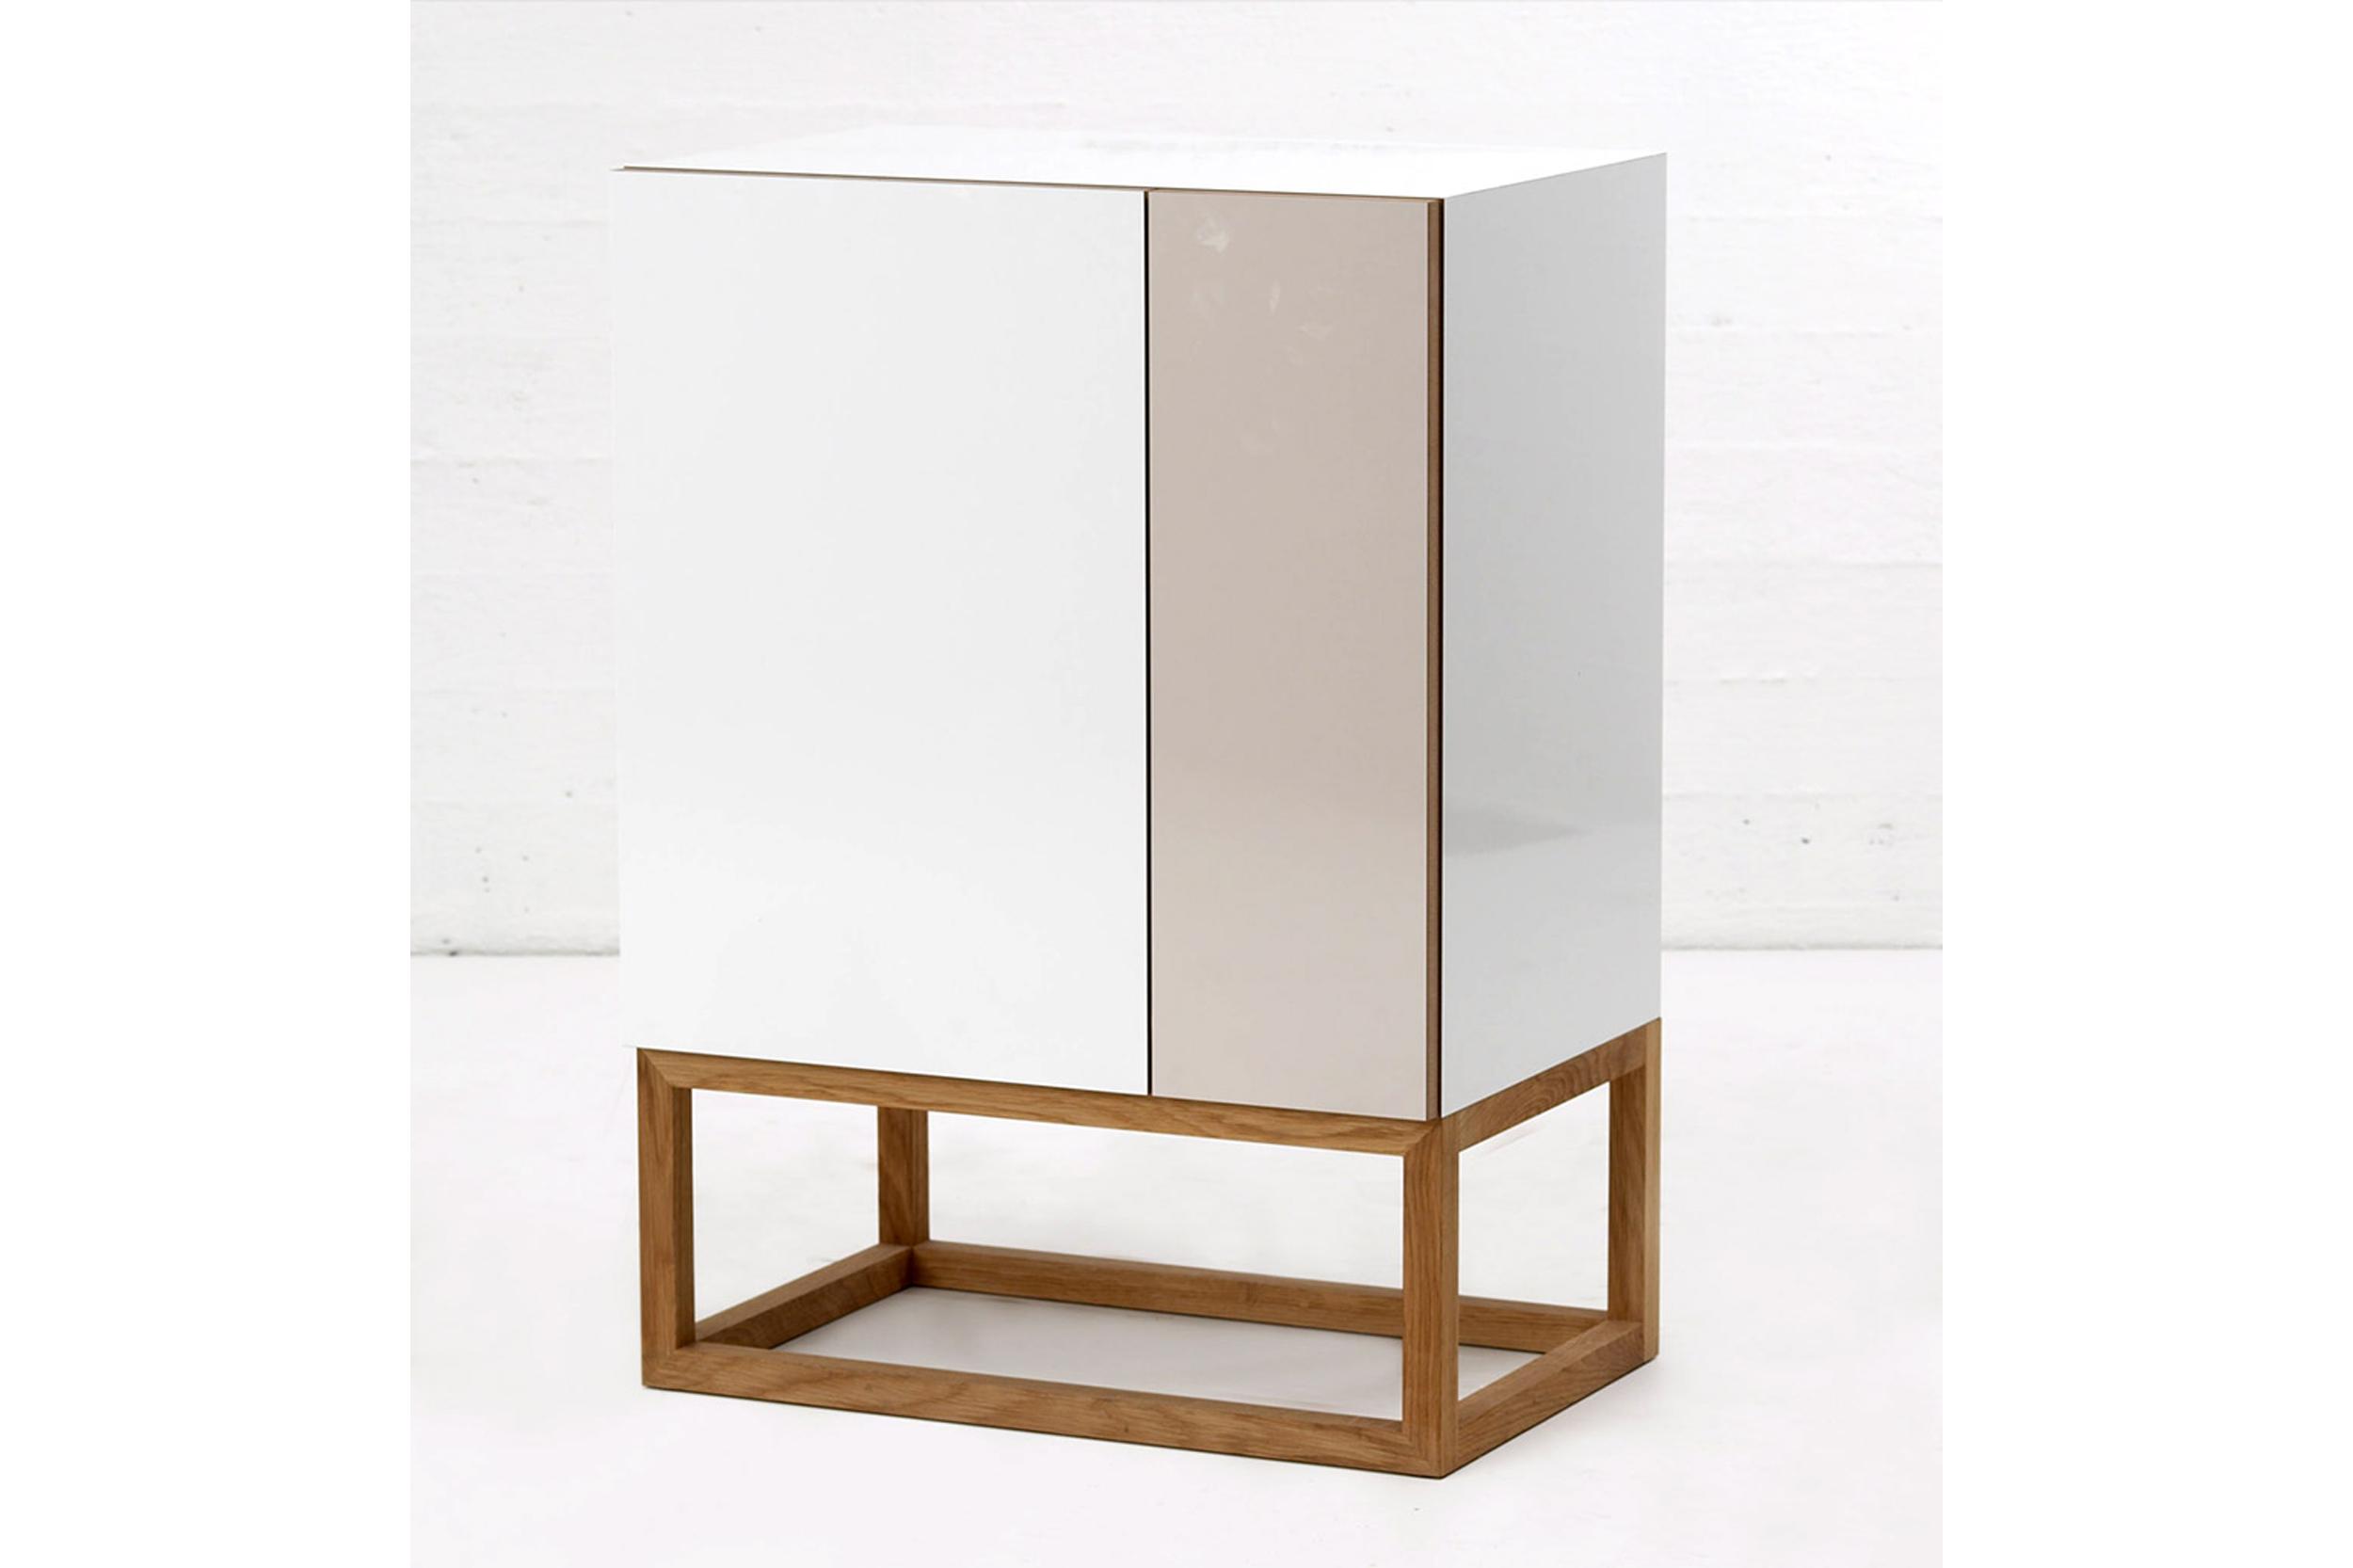 Habitek Stripe cabinet in white and beige